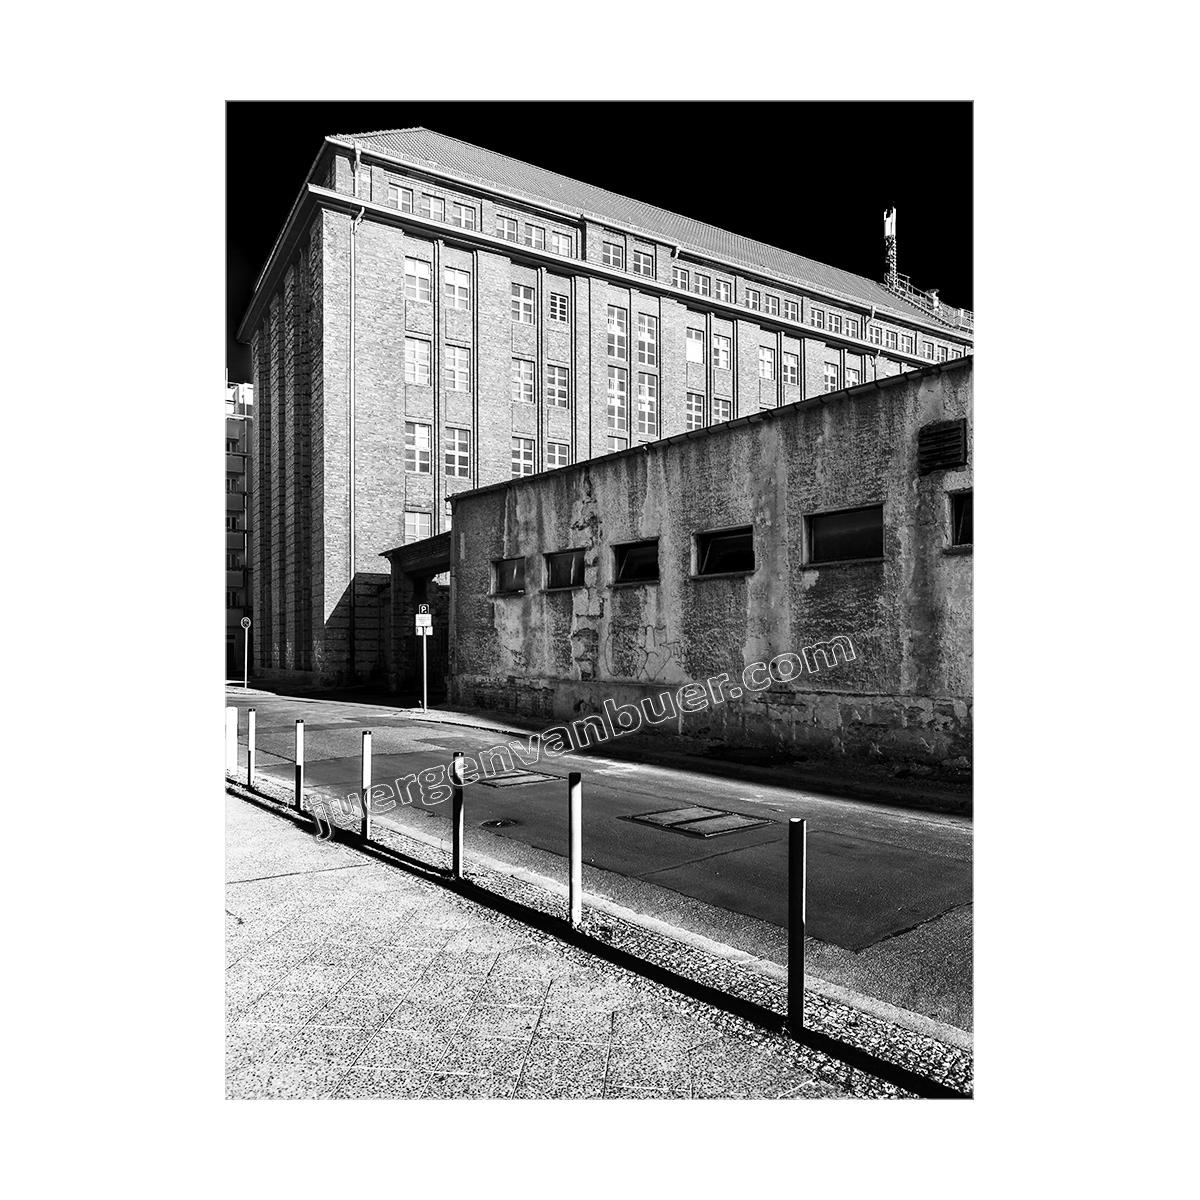 Ziegelstraße 30 Berlin